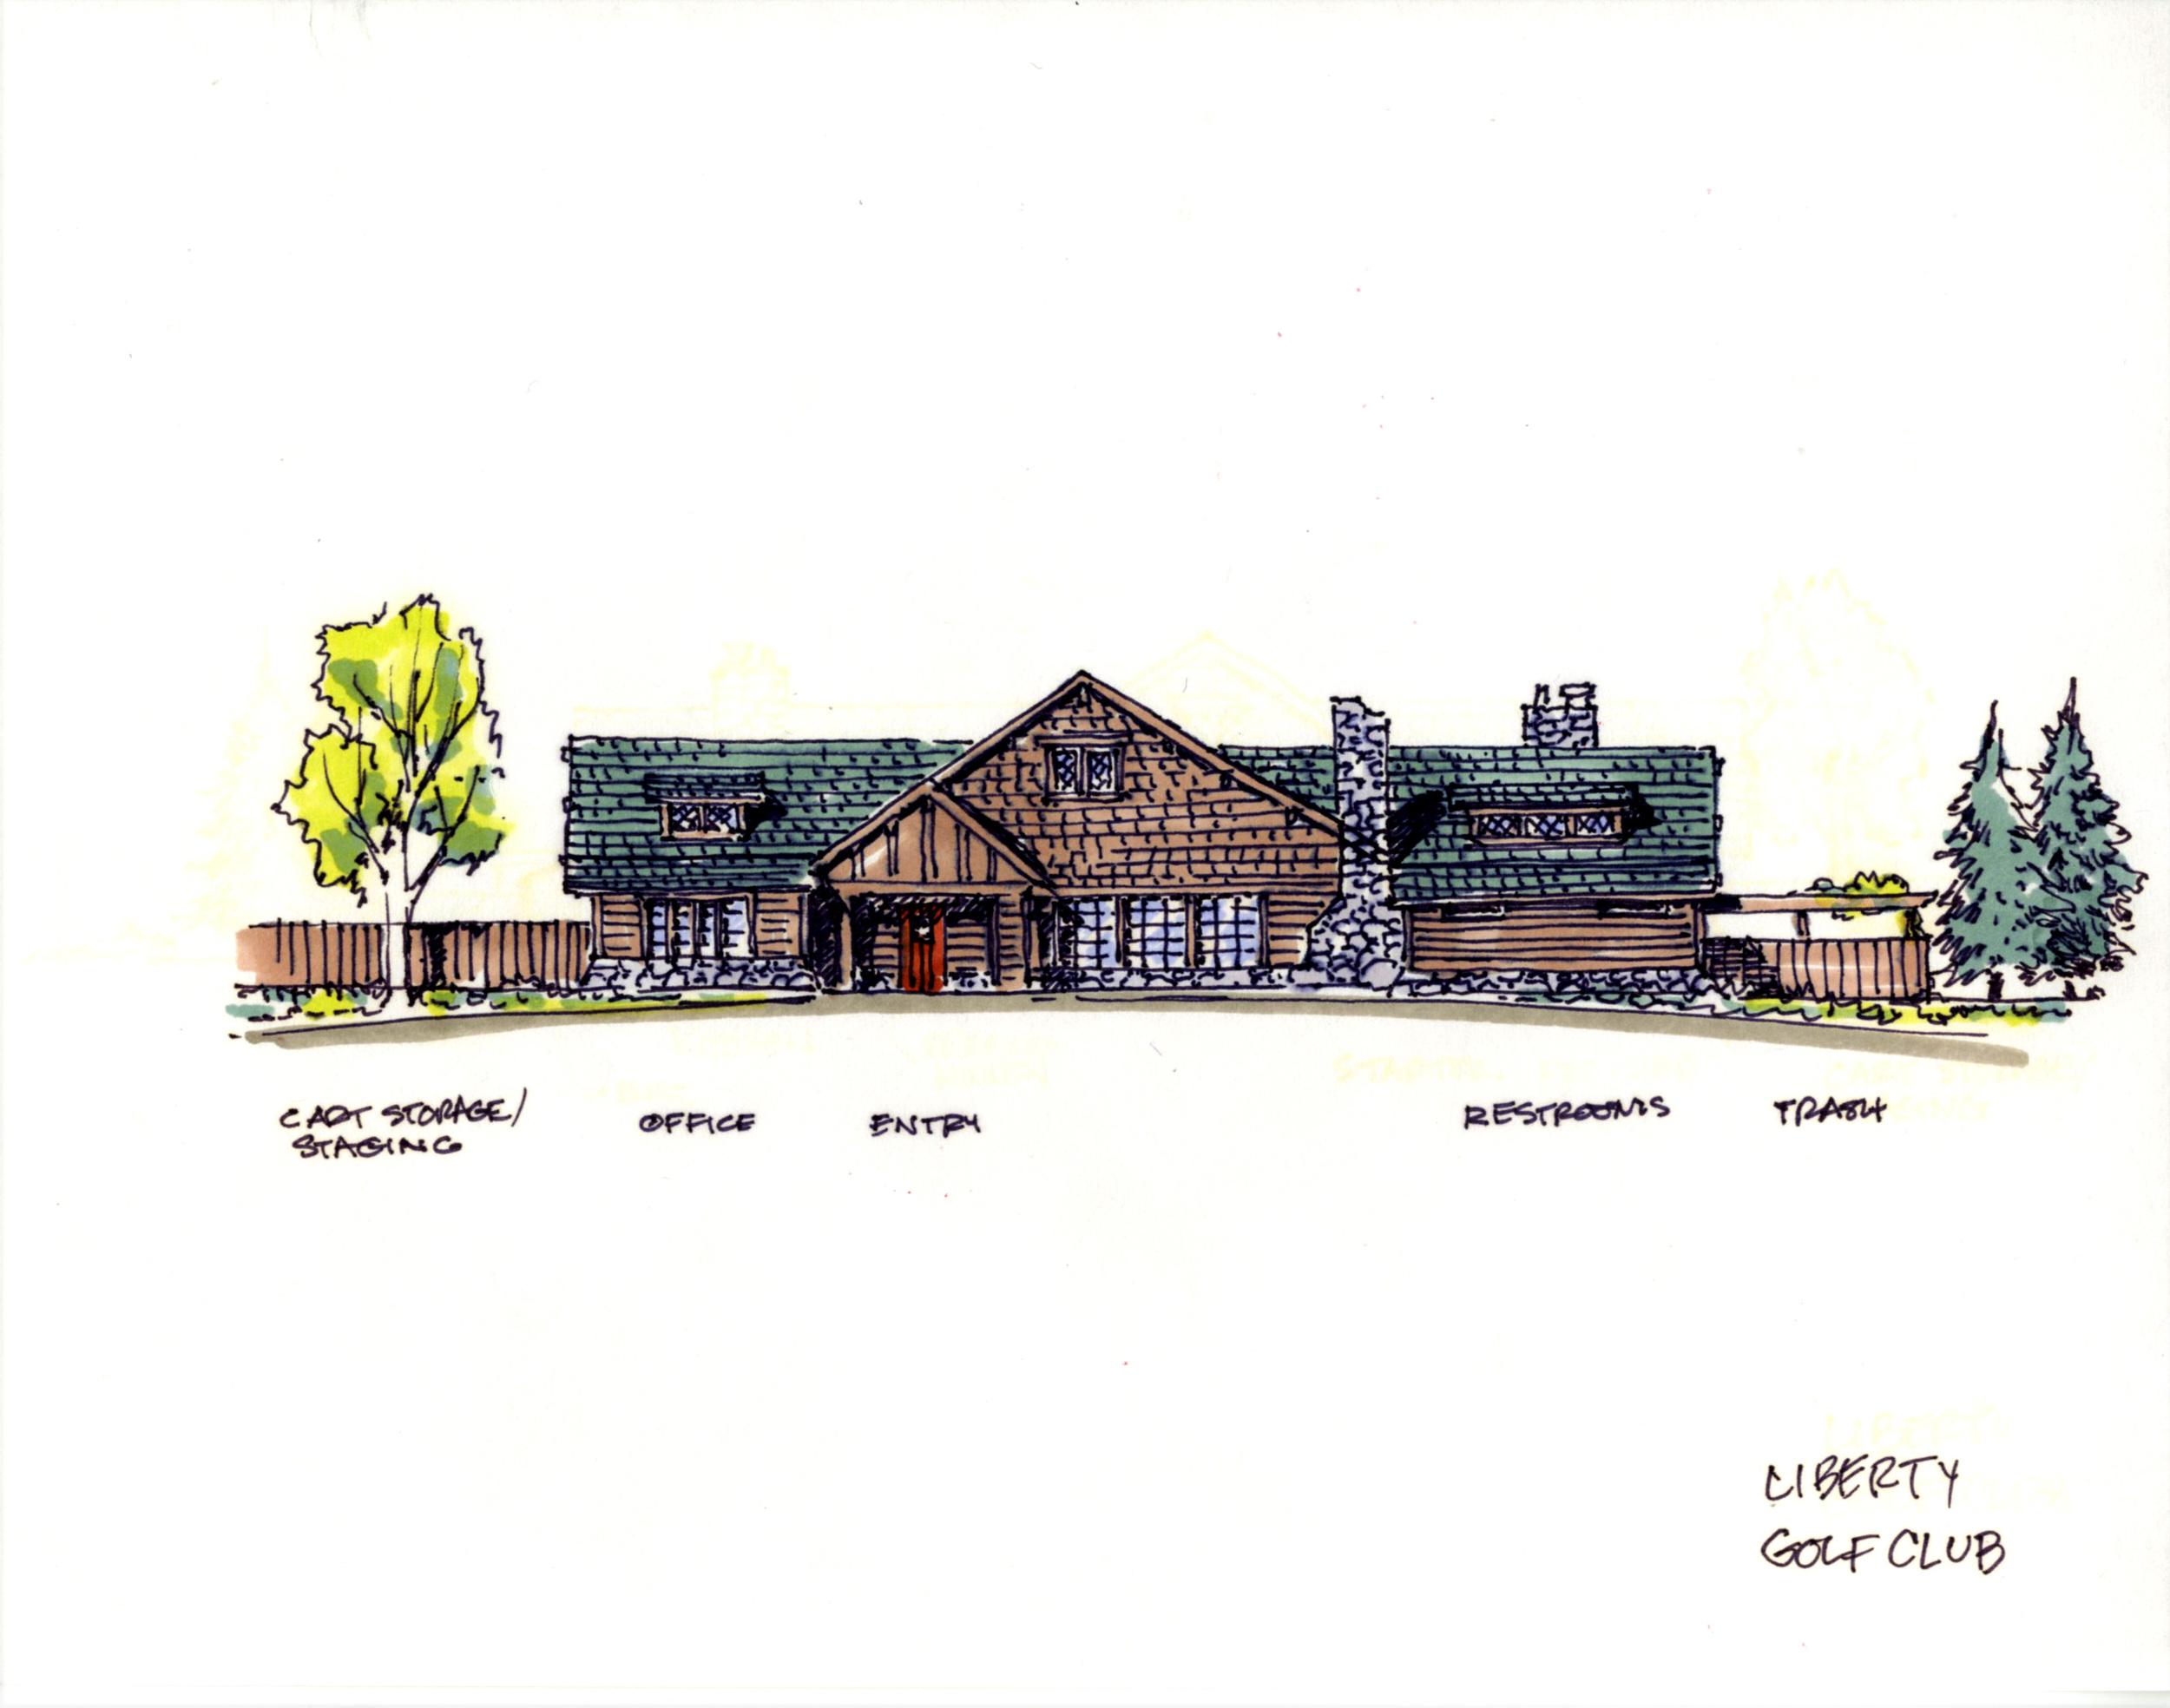 Liberty Golf Club202.jpg